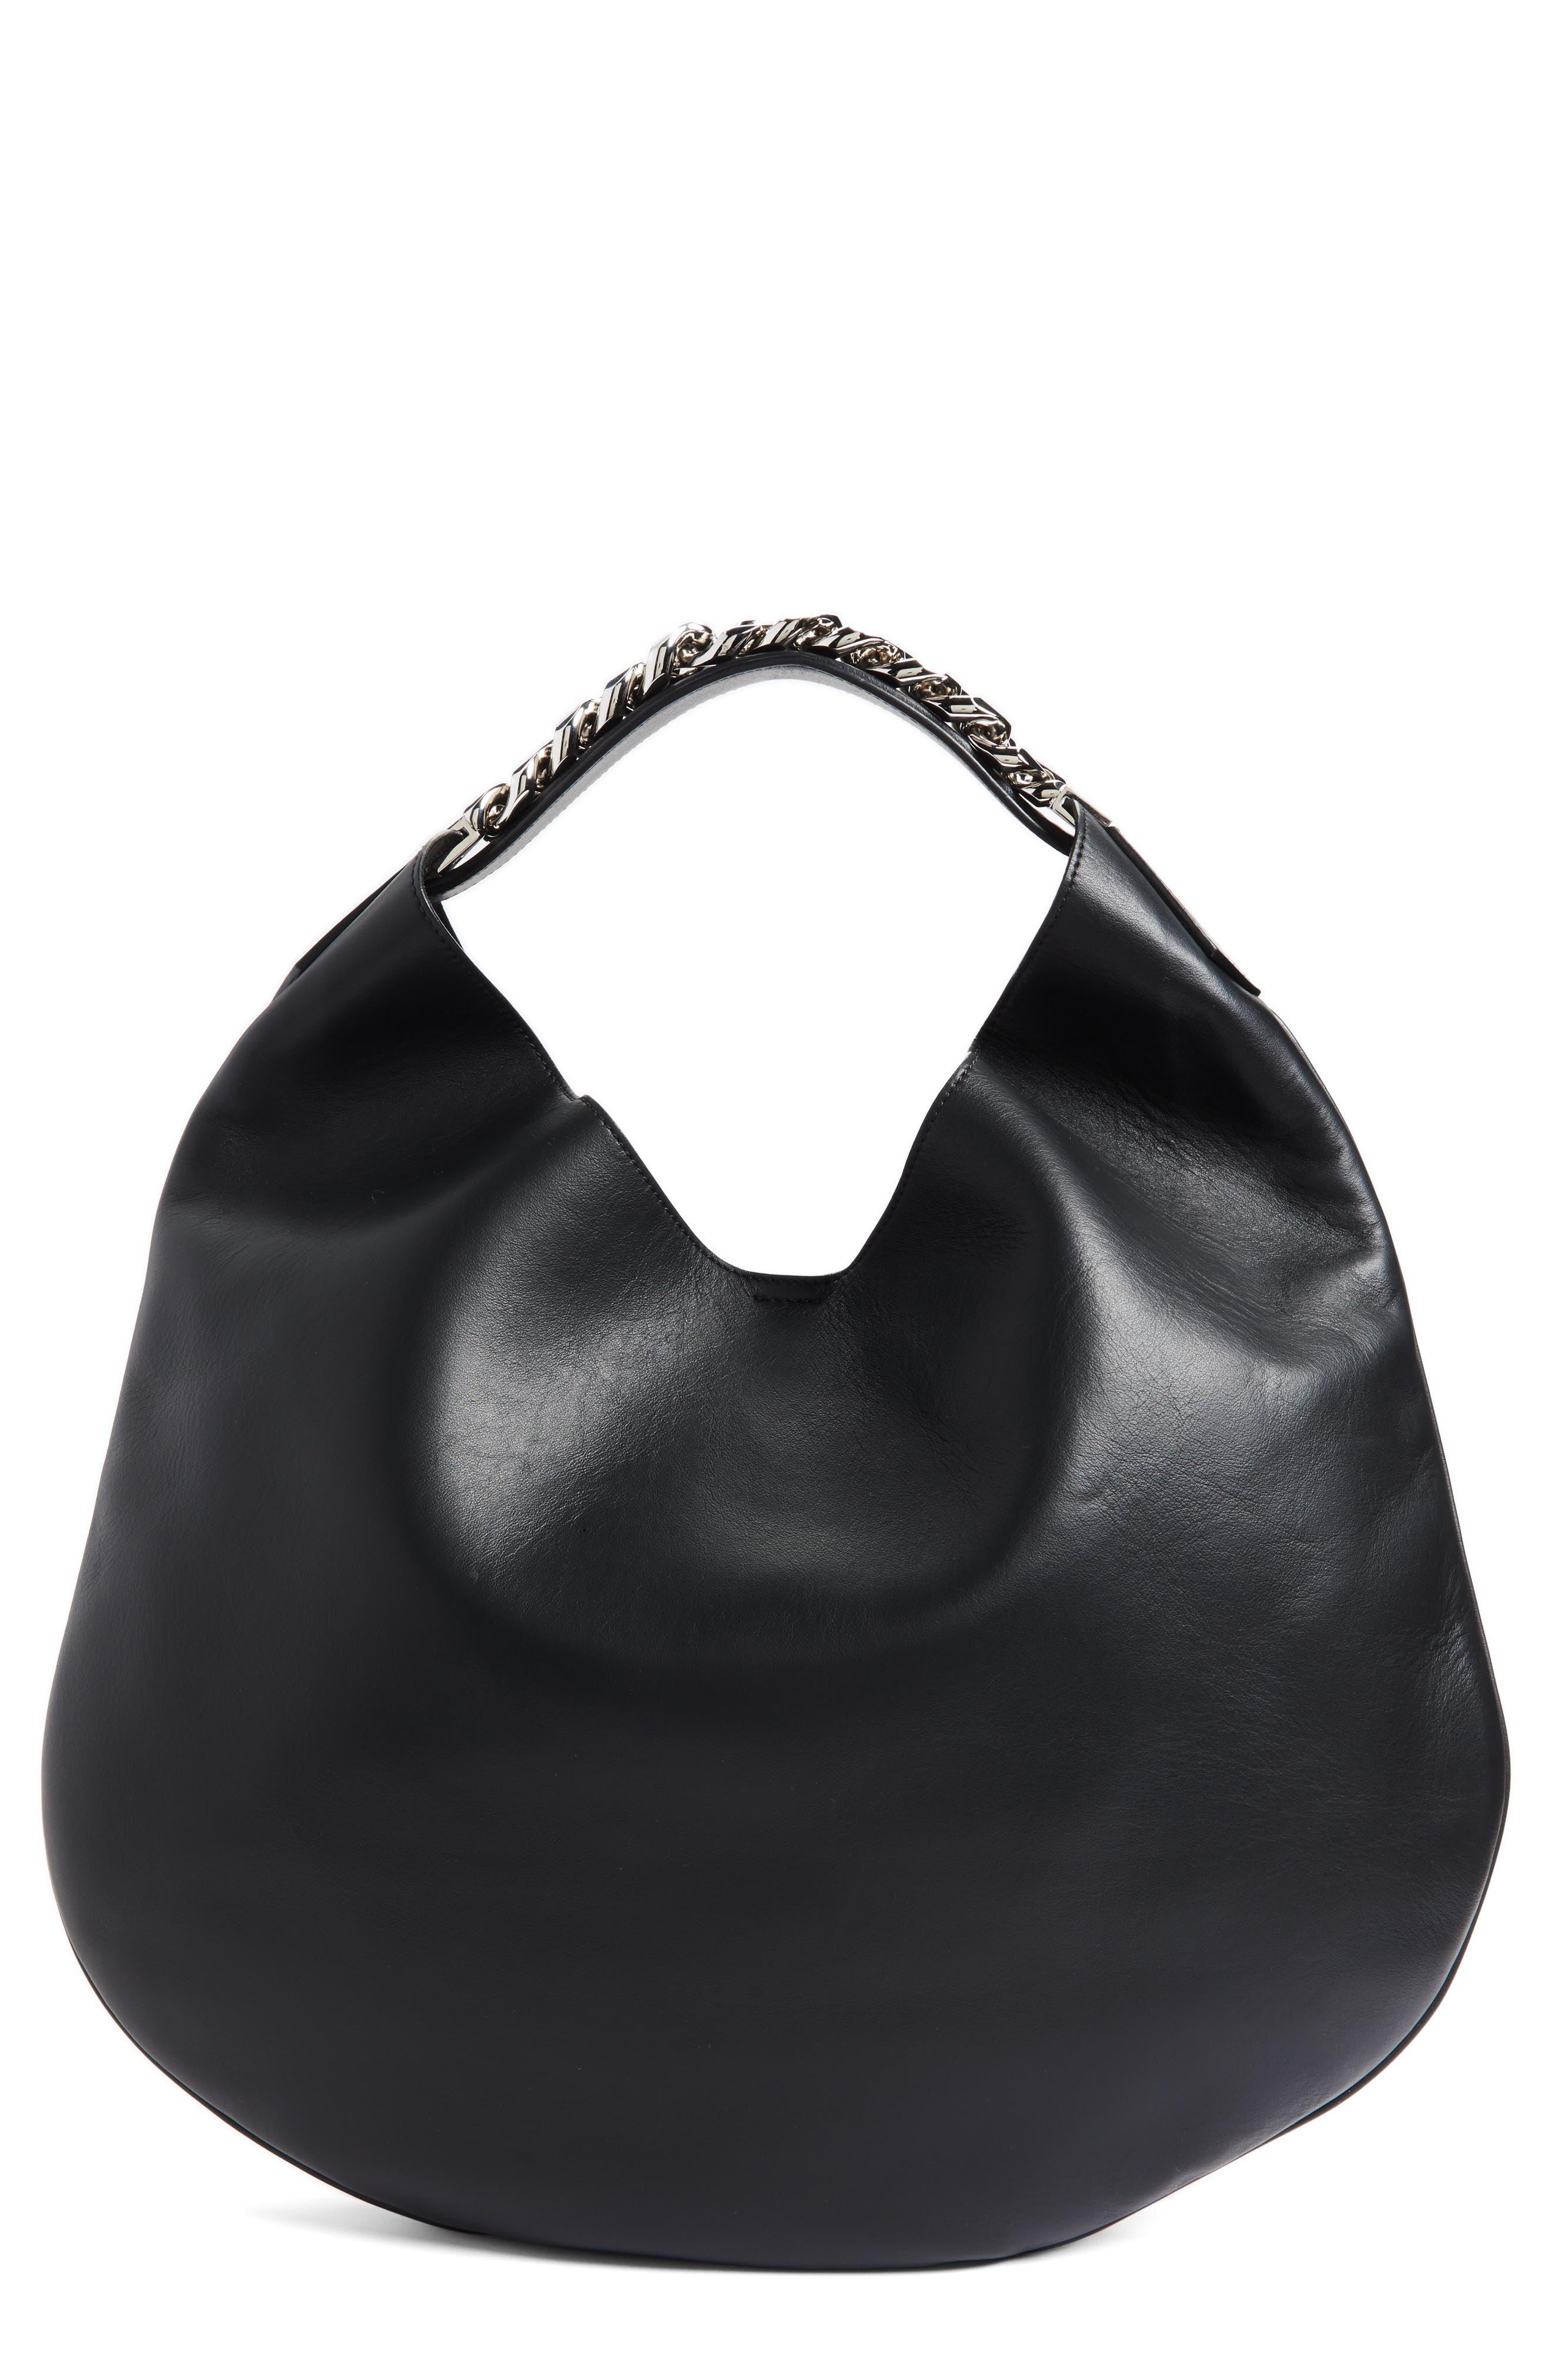 Main Image - Givenchy Medium Infinity Calfskin Leather Hobo